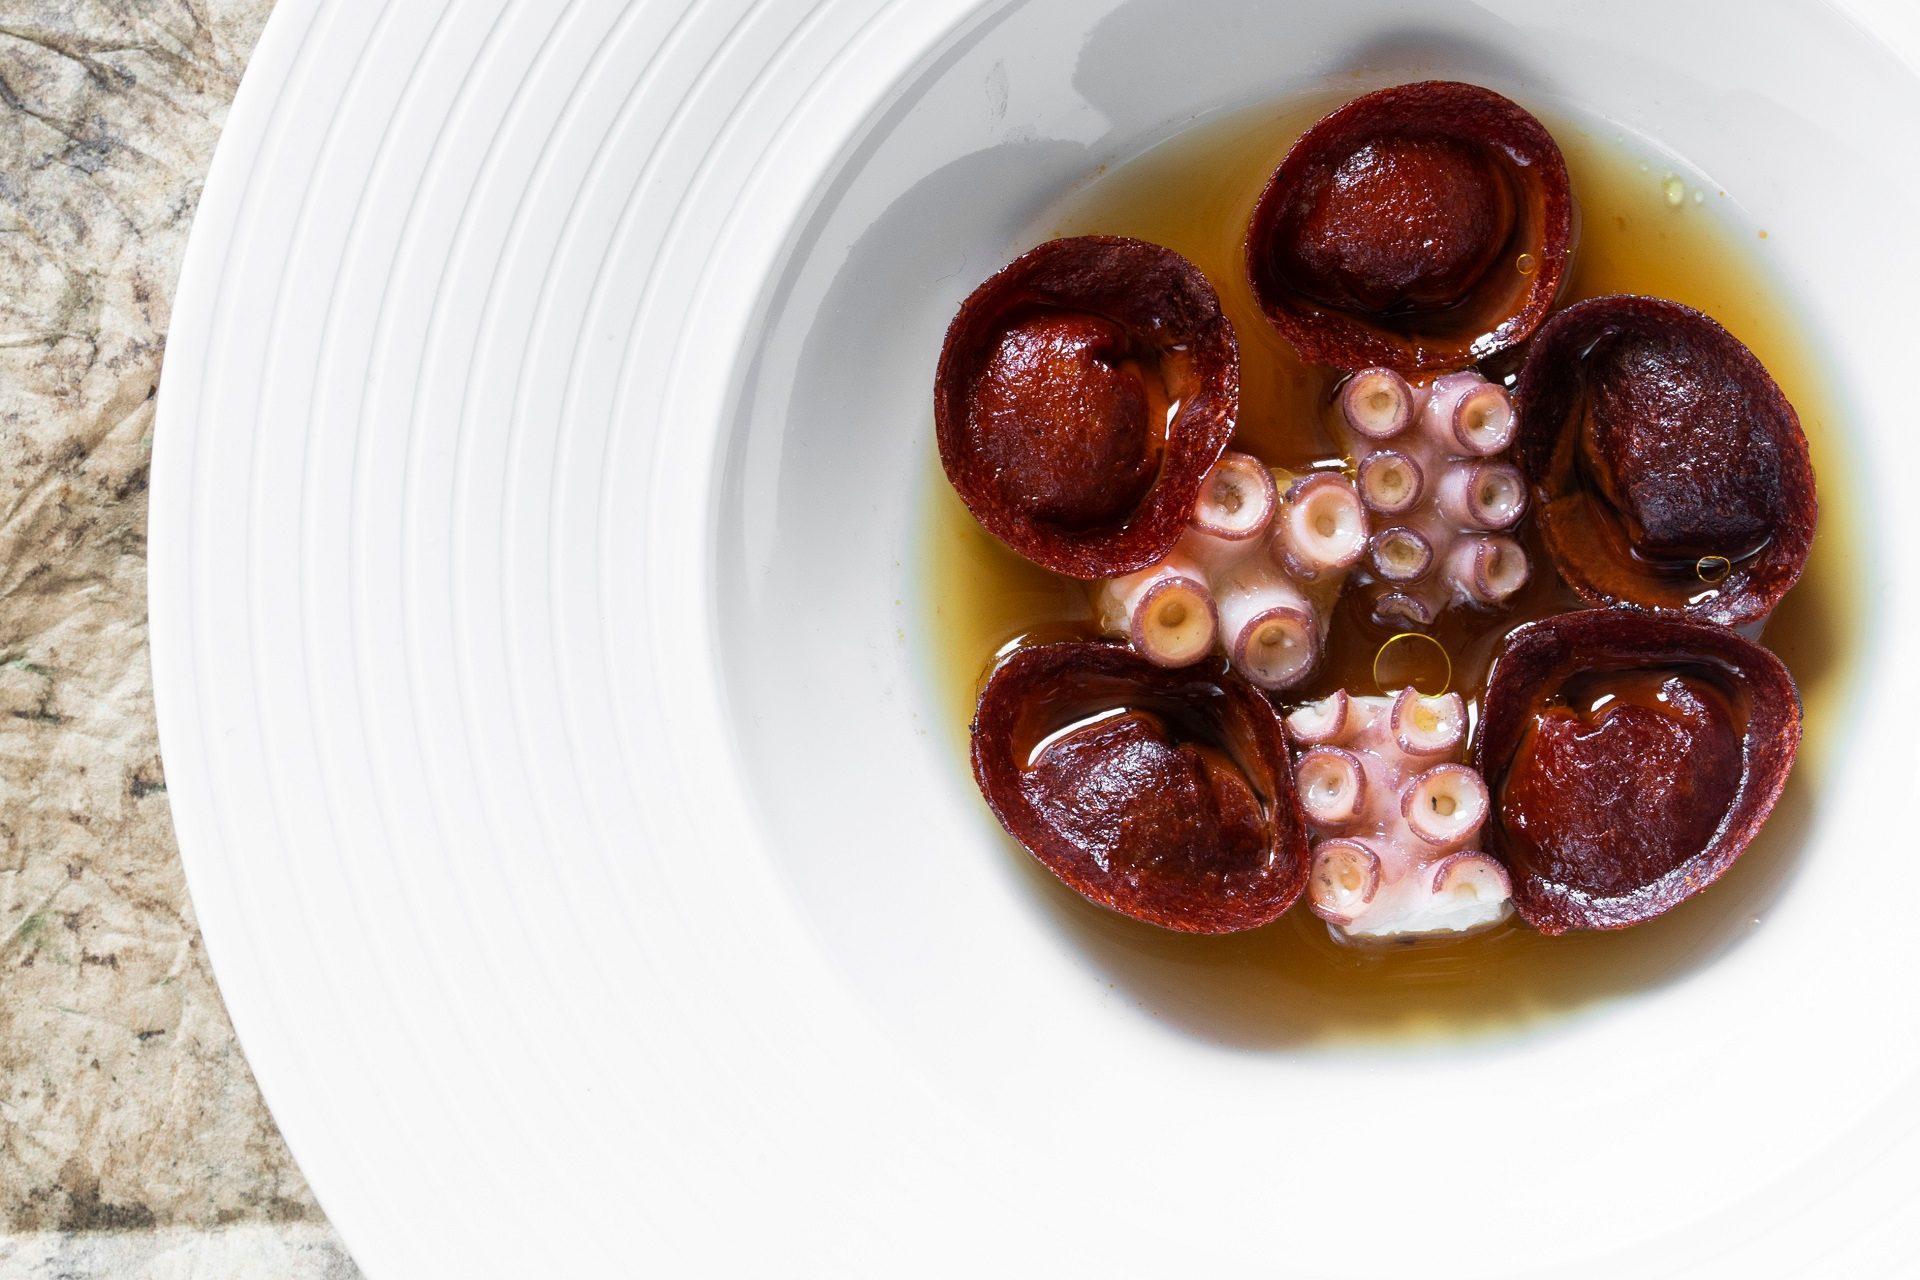 Pepe - Mirazur New Moon menu